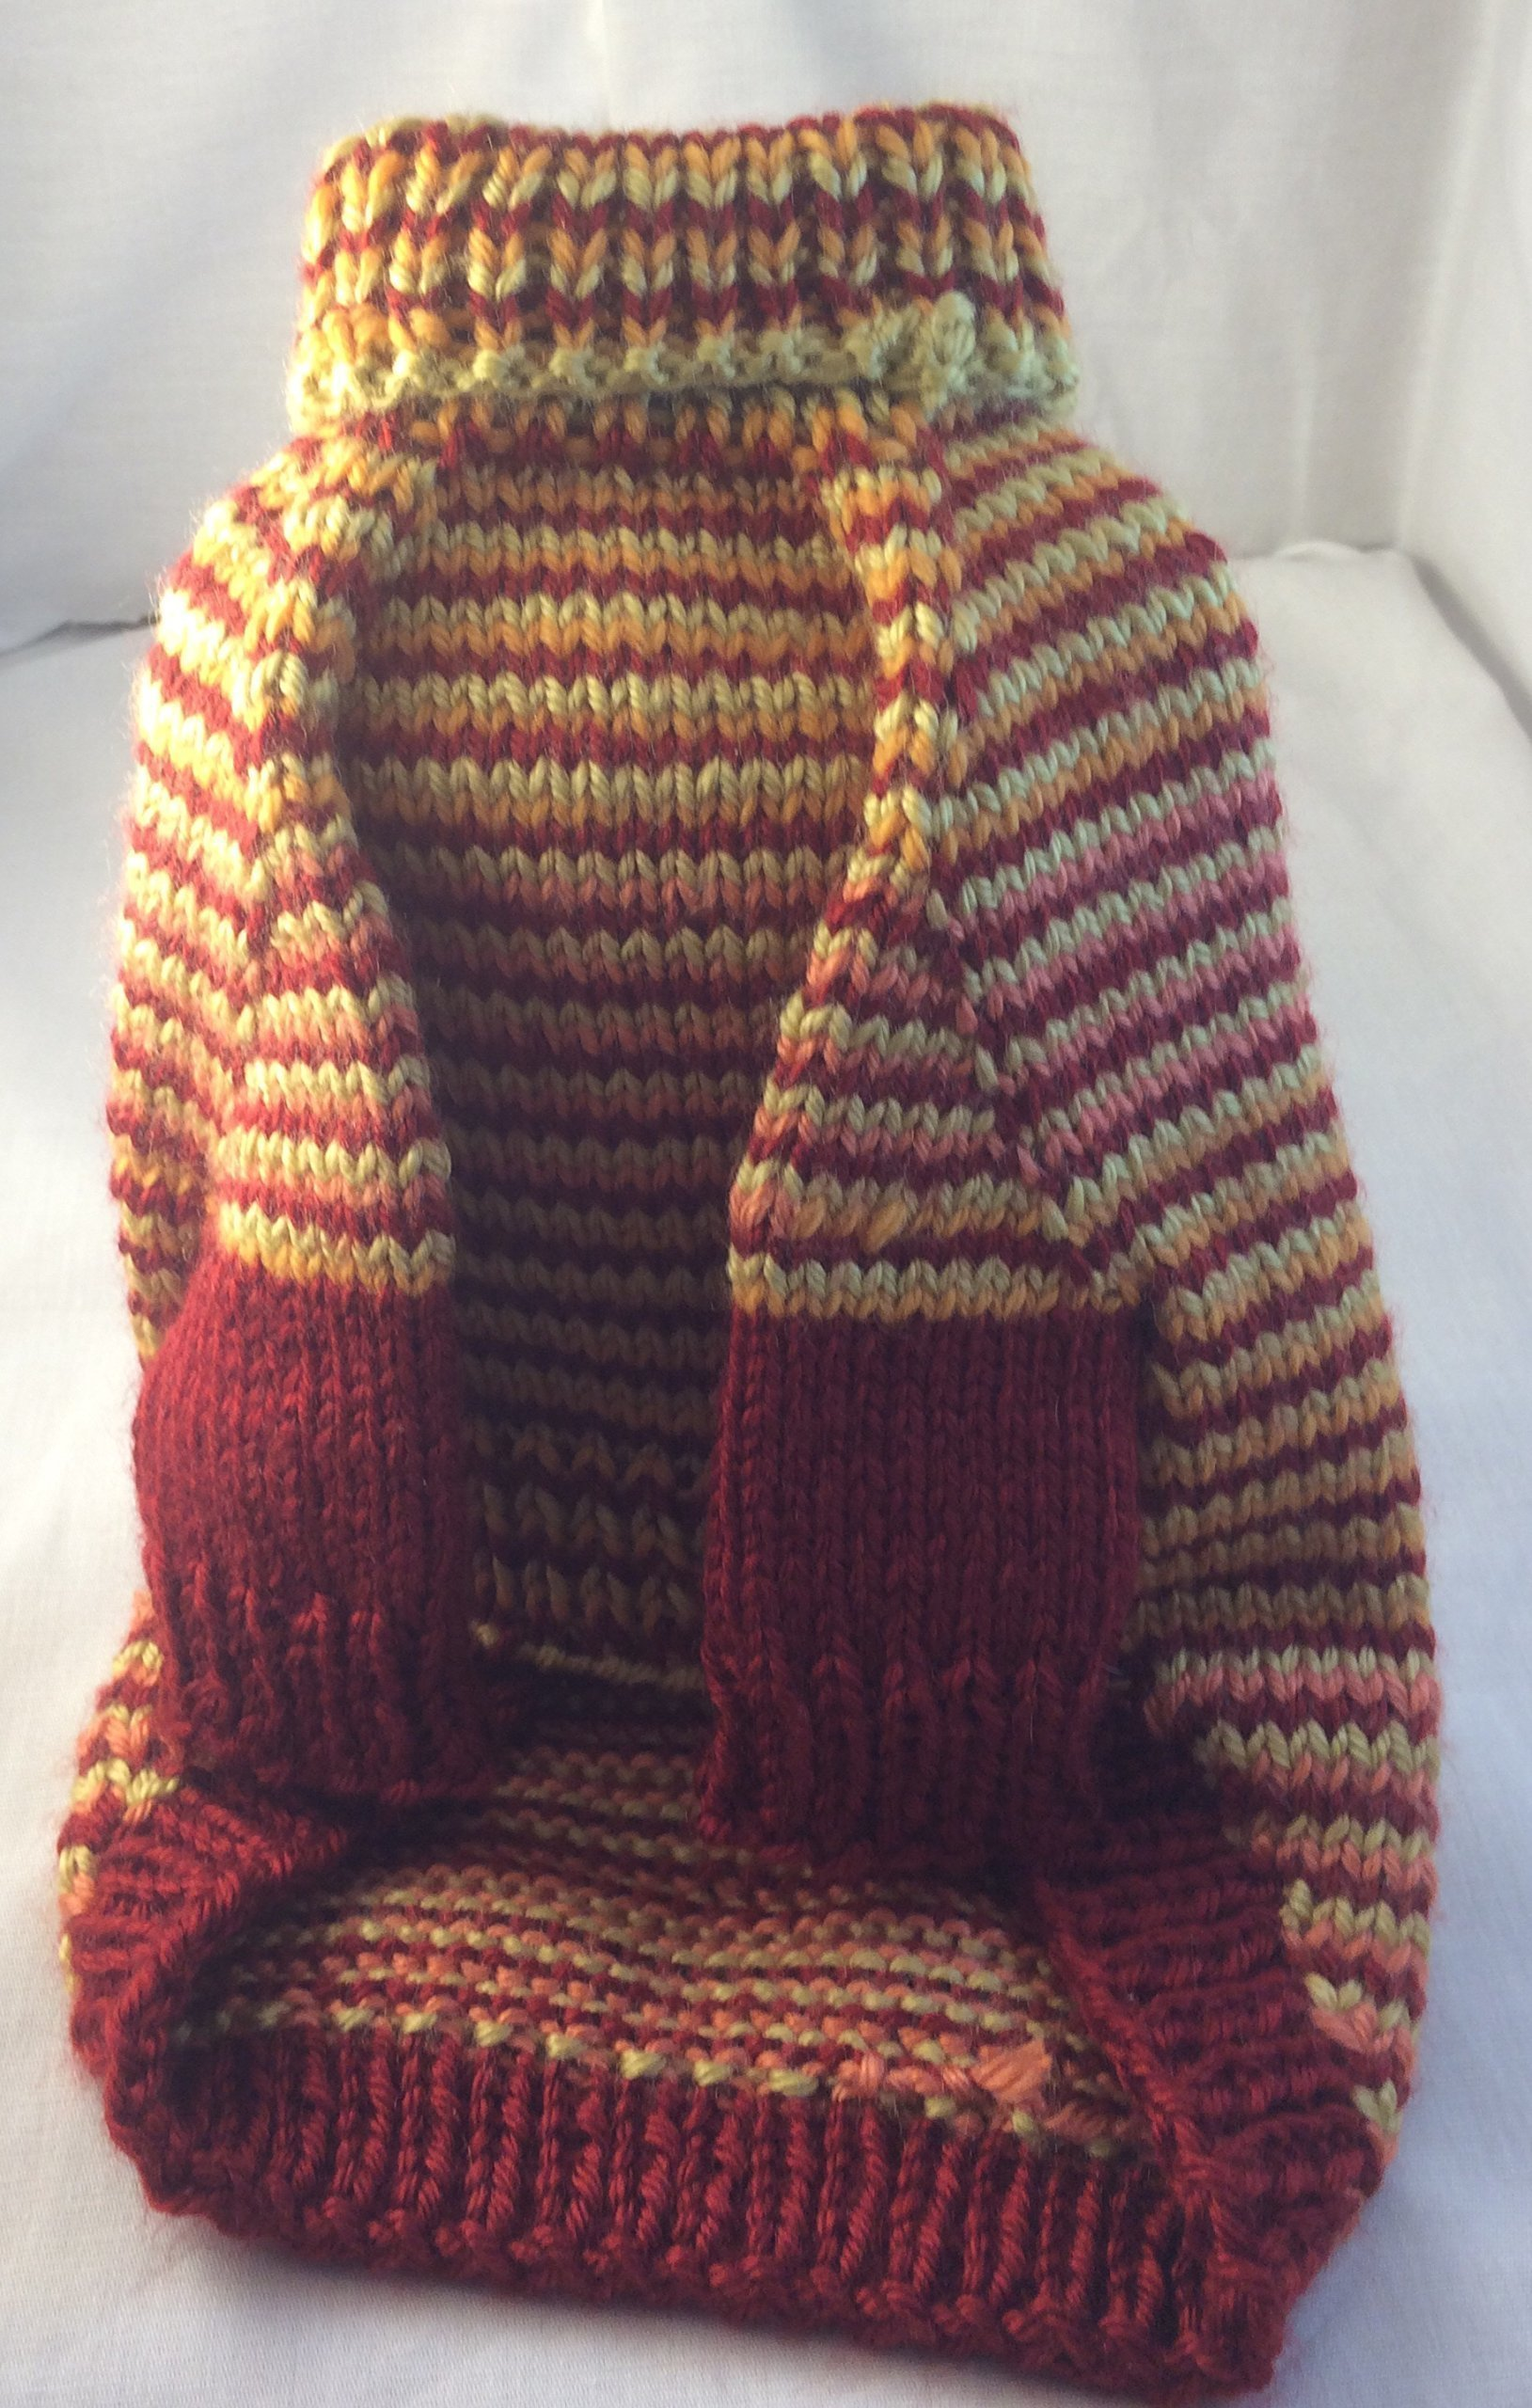 Hand knit turtleneck, long sleeve pet sweater.